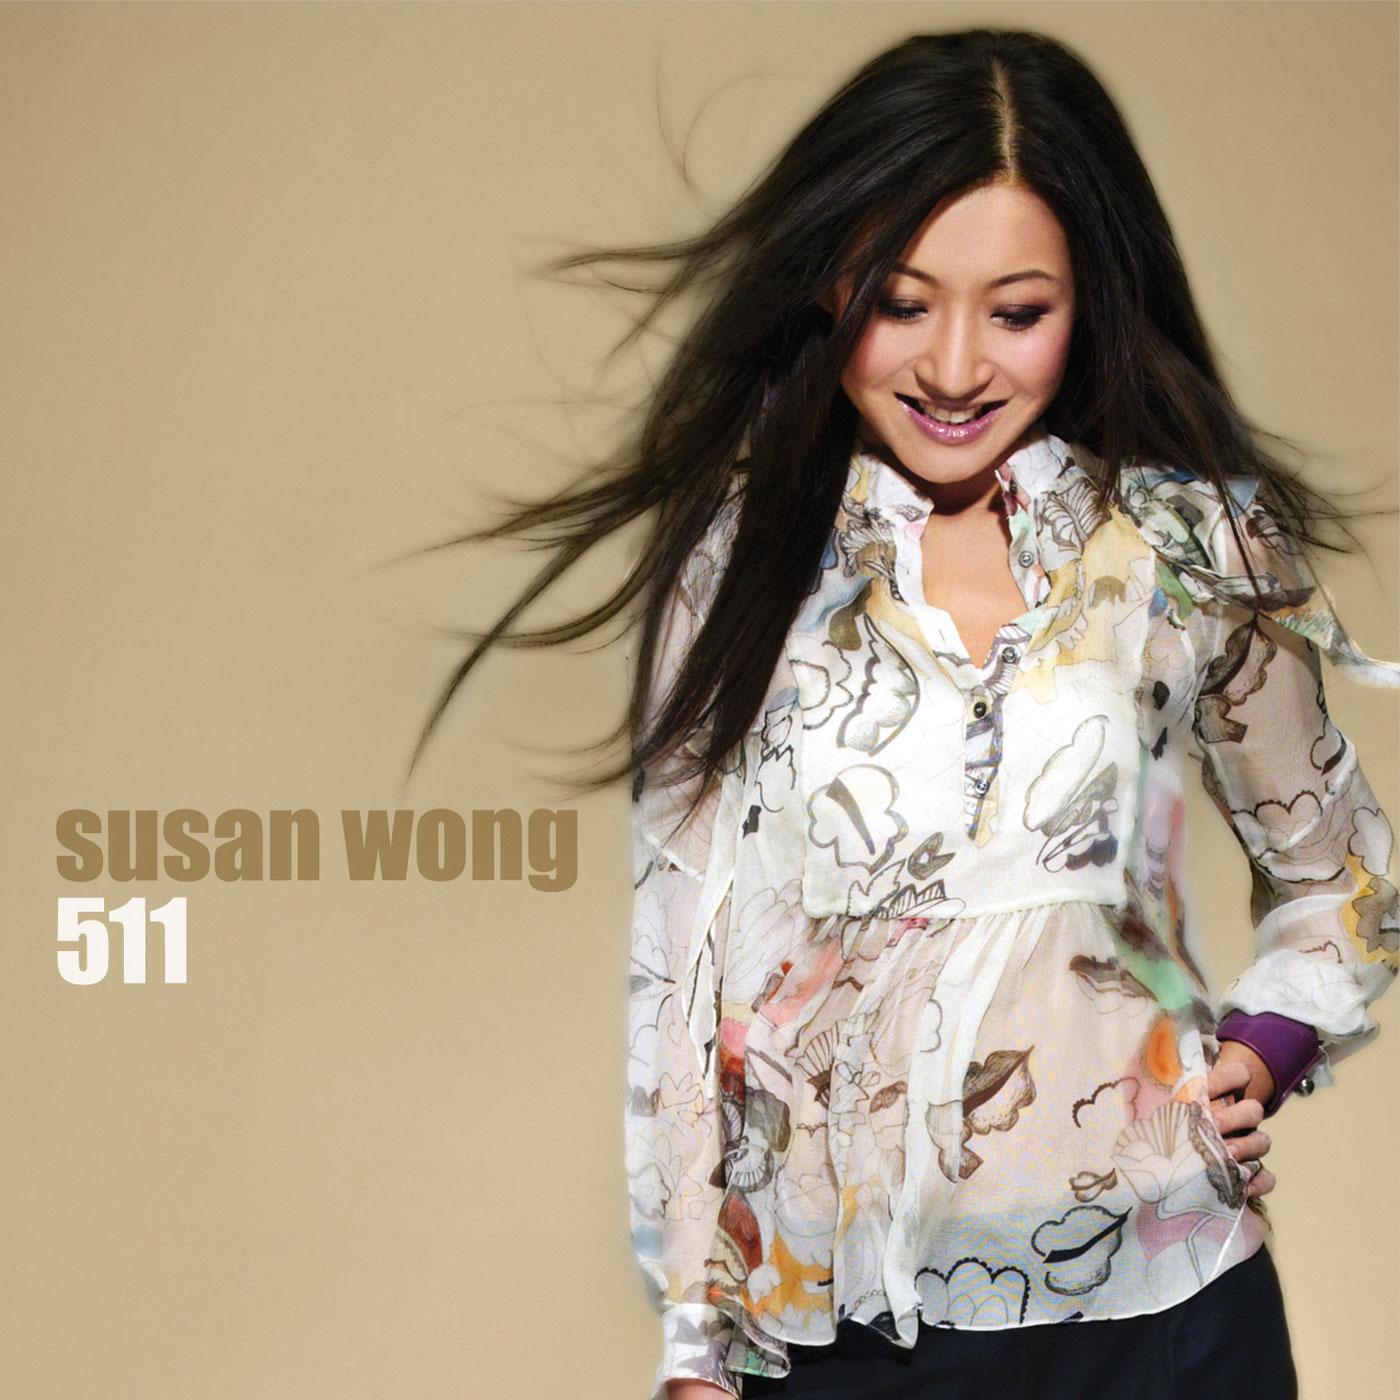 Susan Wong 511 Album